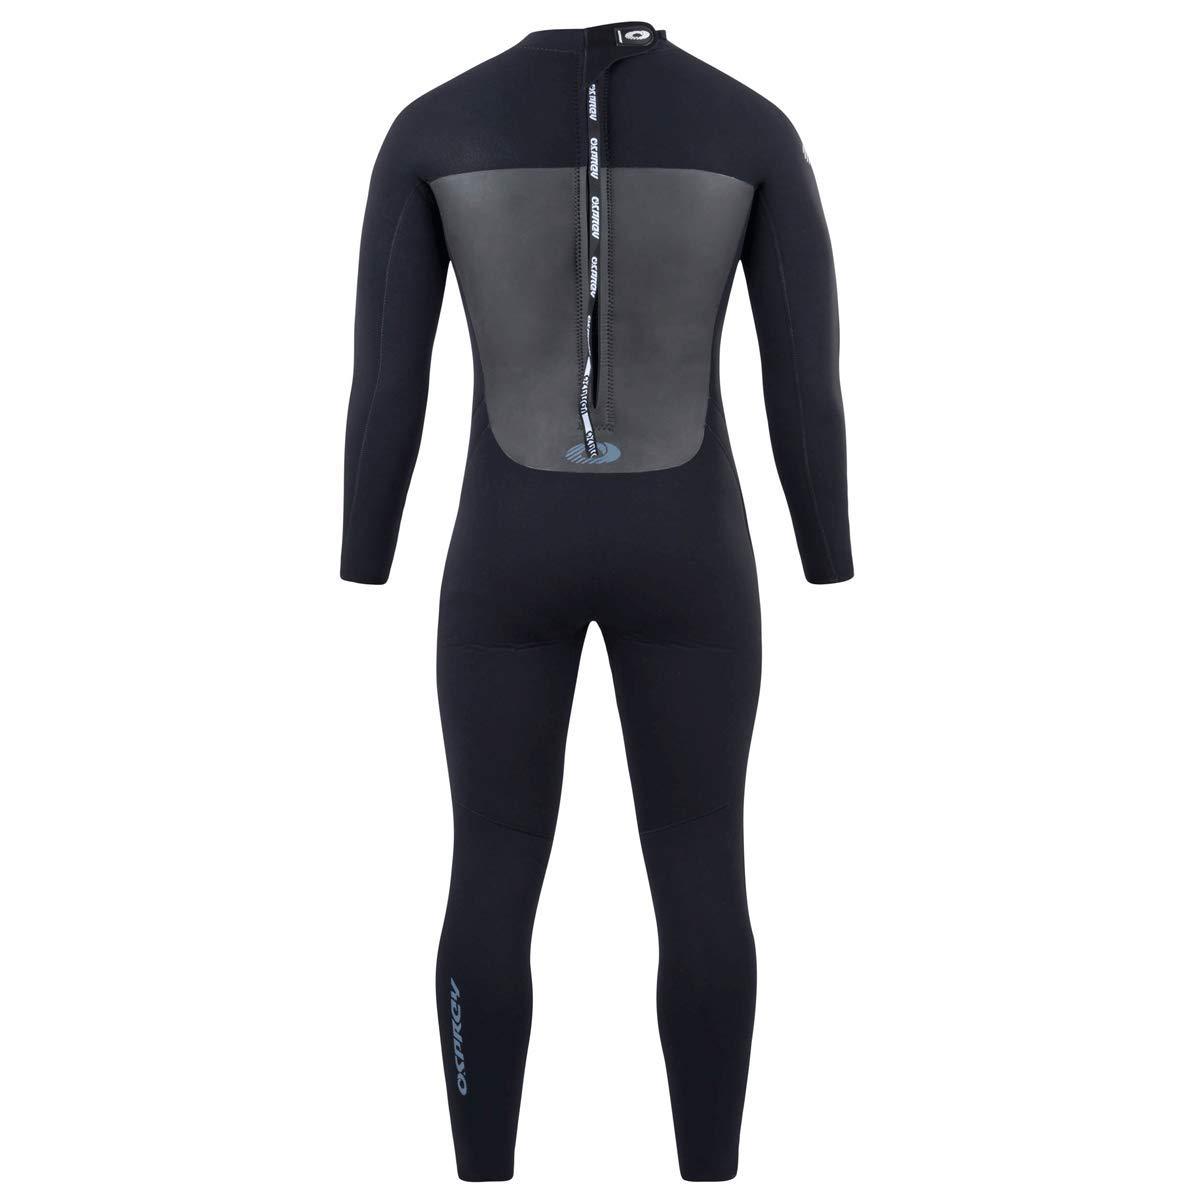 7b7b94c12c52 Osprey Men's 5 Mm Full Length Winter Wetsuit Origin: Amazon.co.uk: Clothing